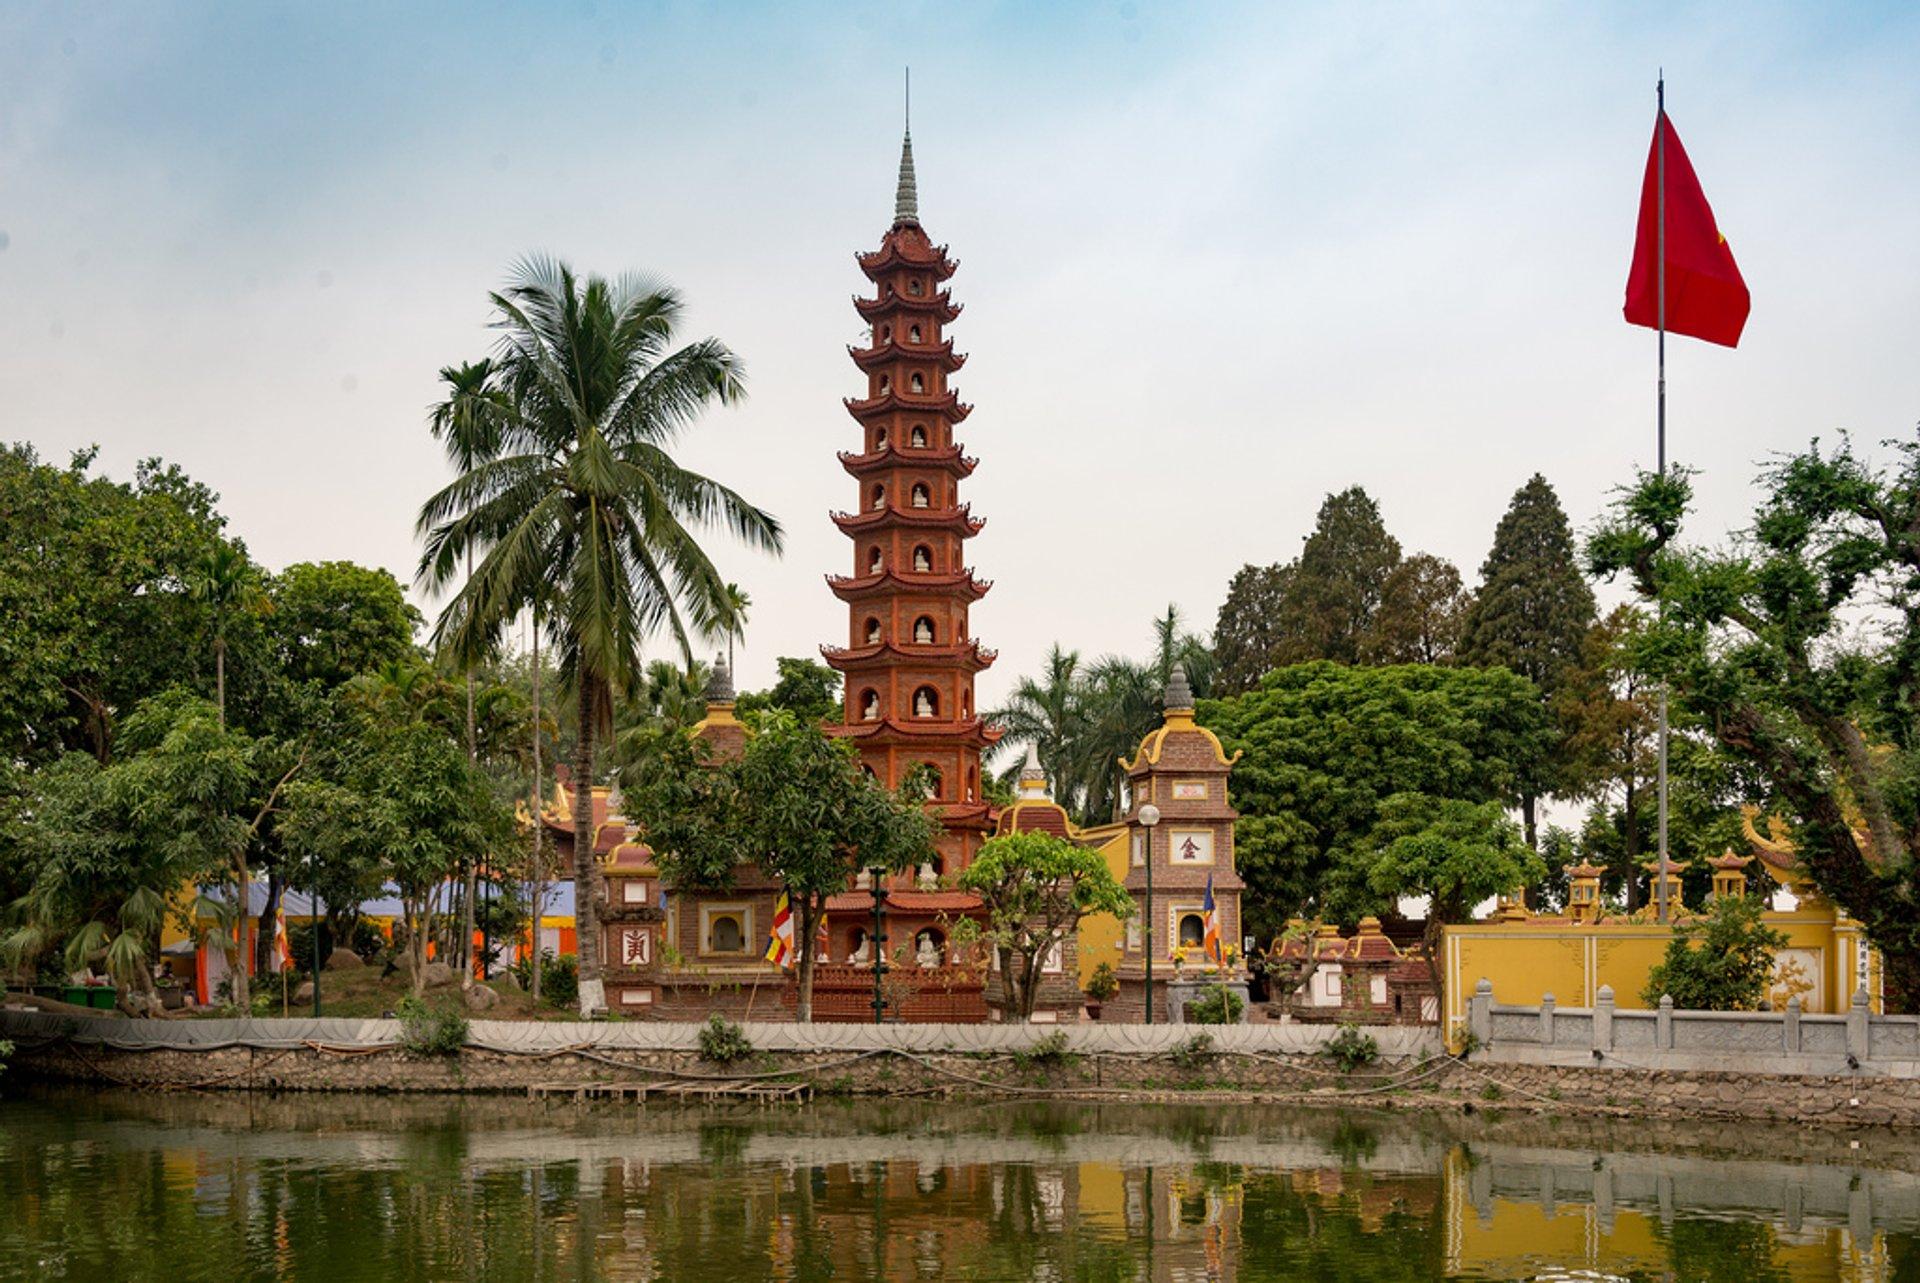 North Vietnam Dry Season in Vietnam 2020 - Best Time